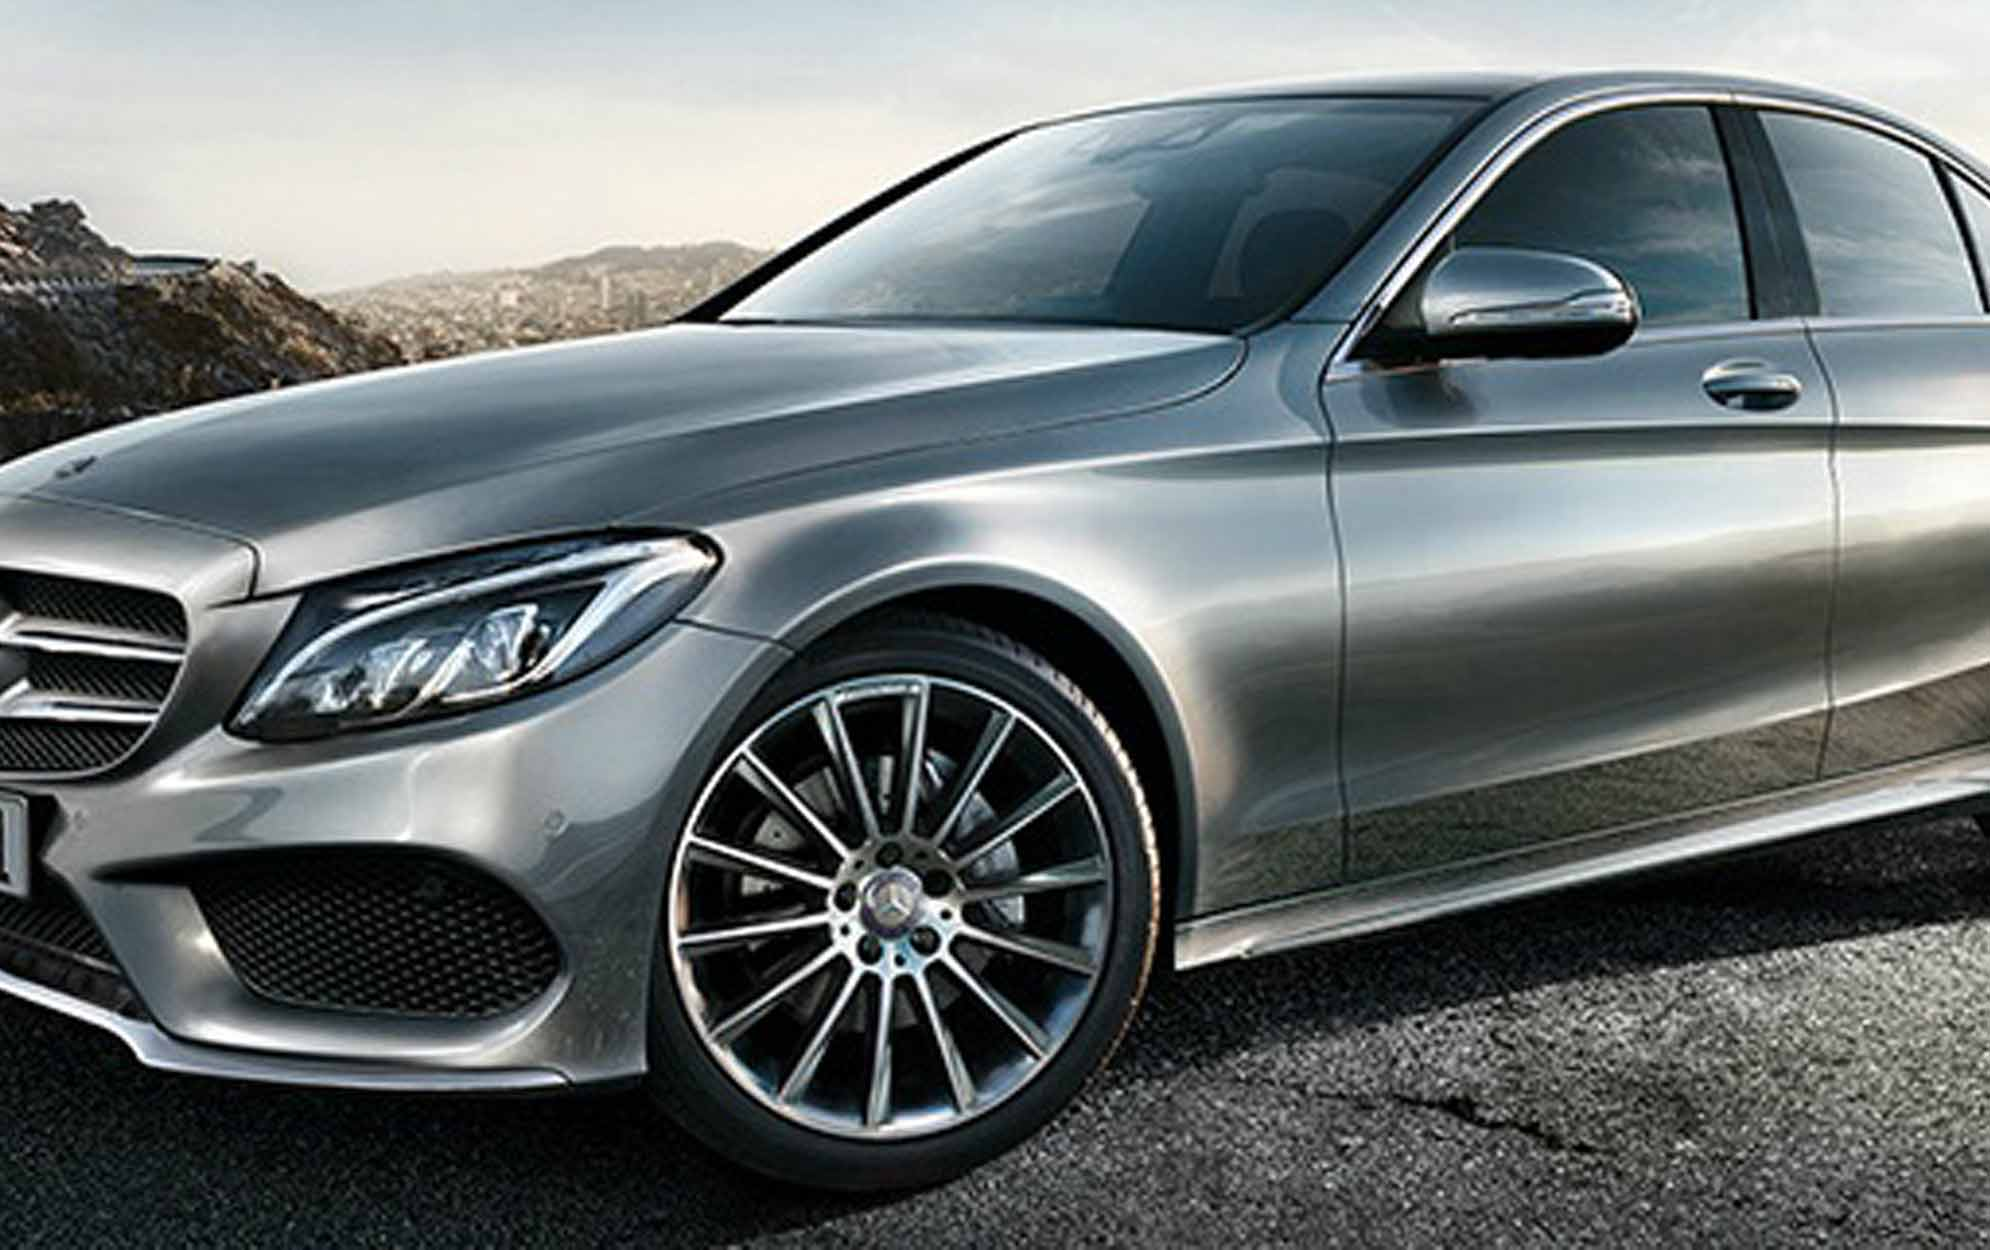 Luxury Car Hire Services